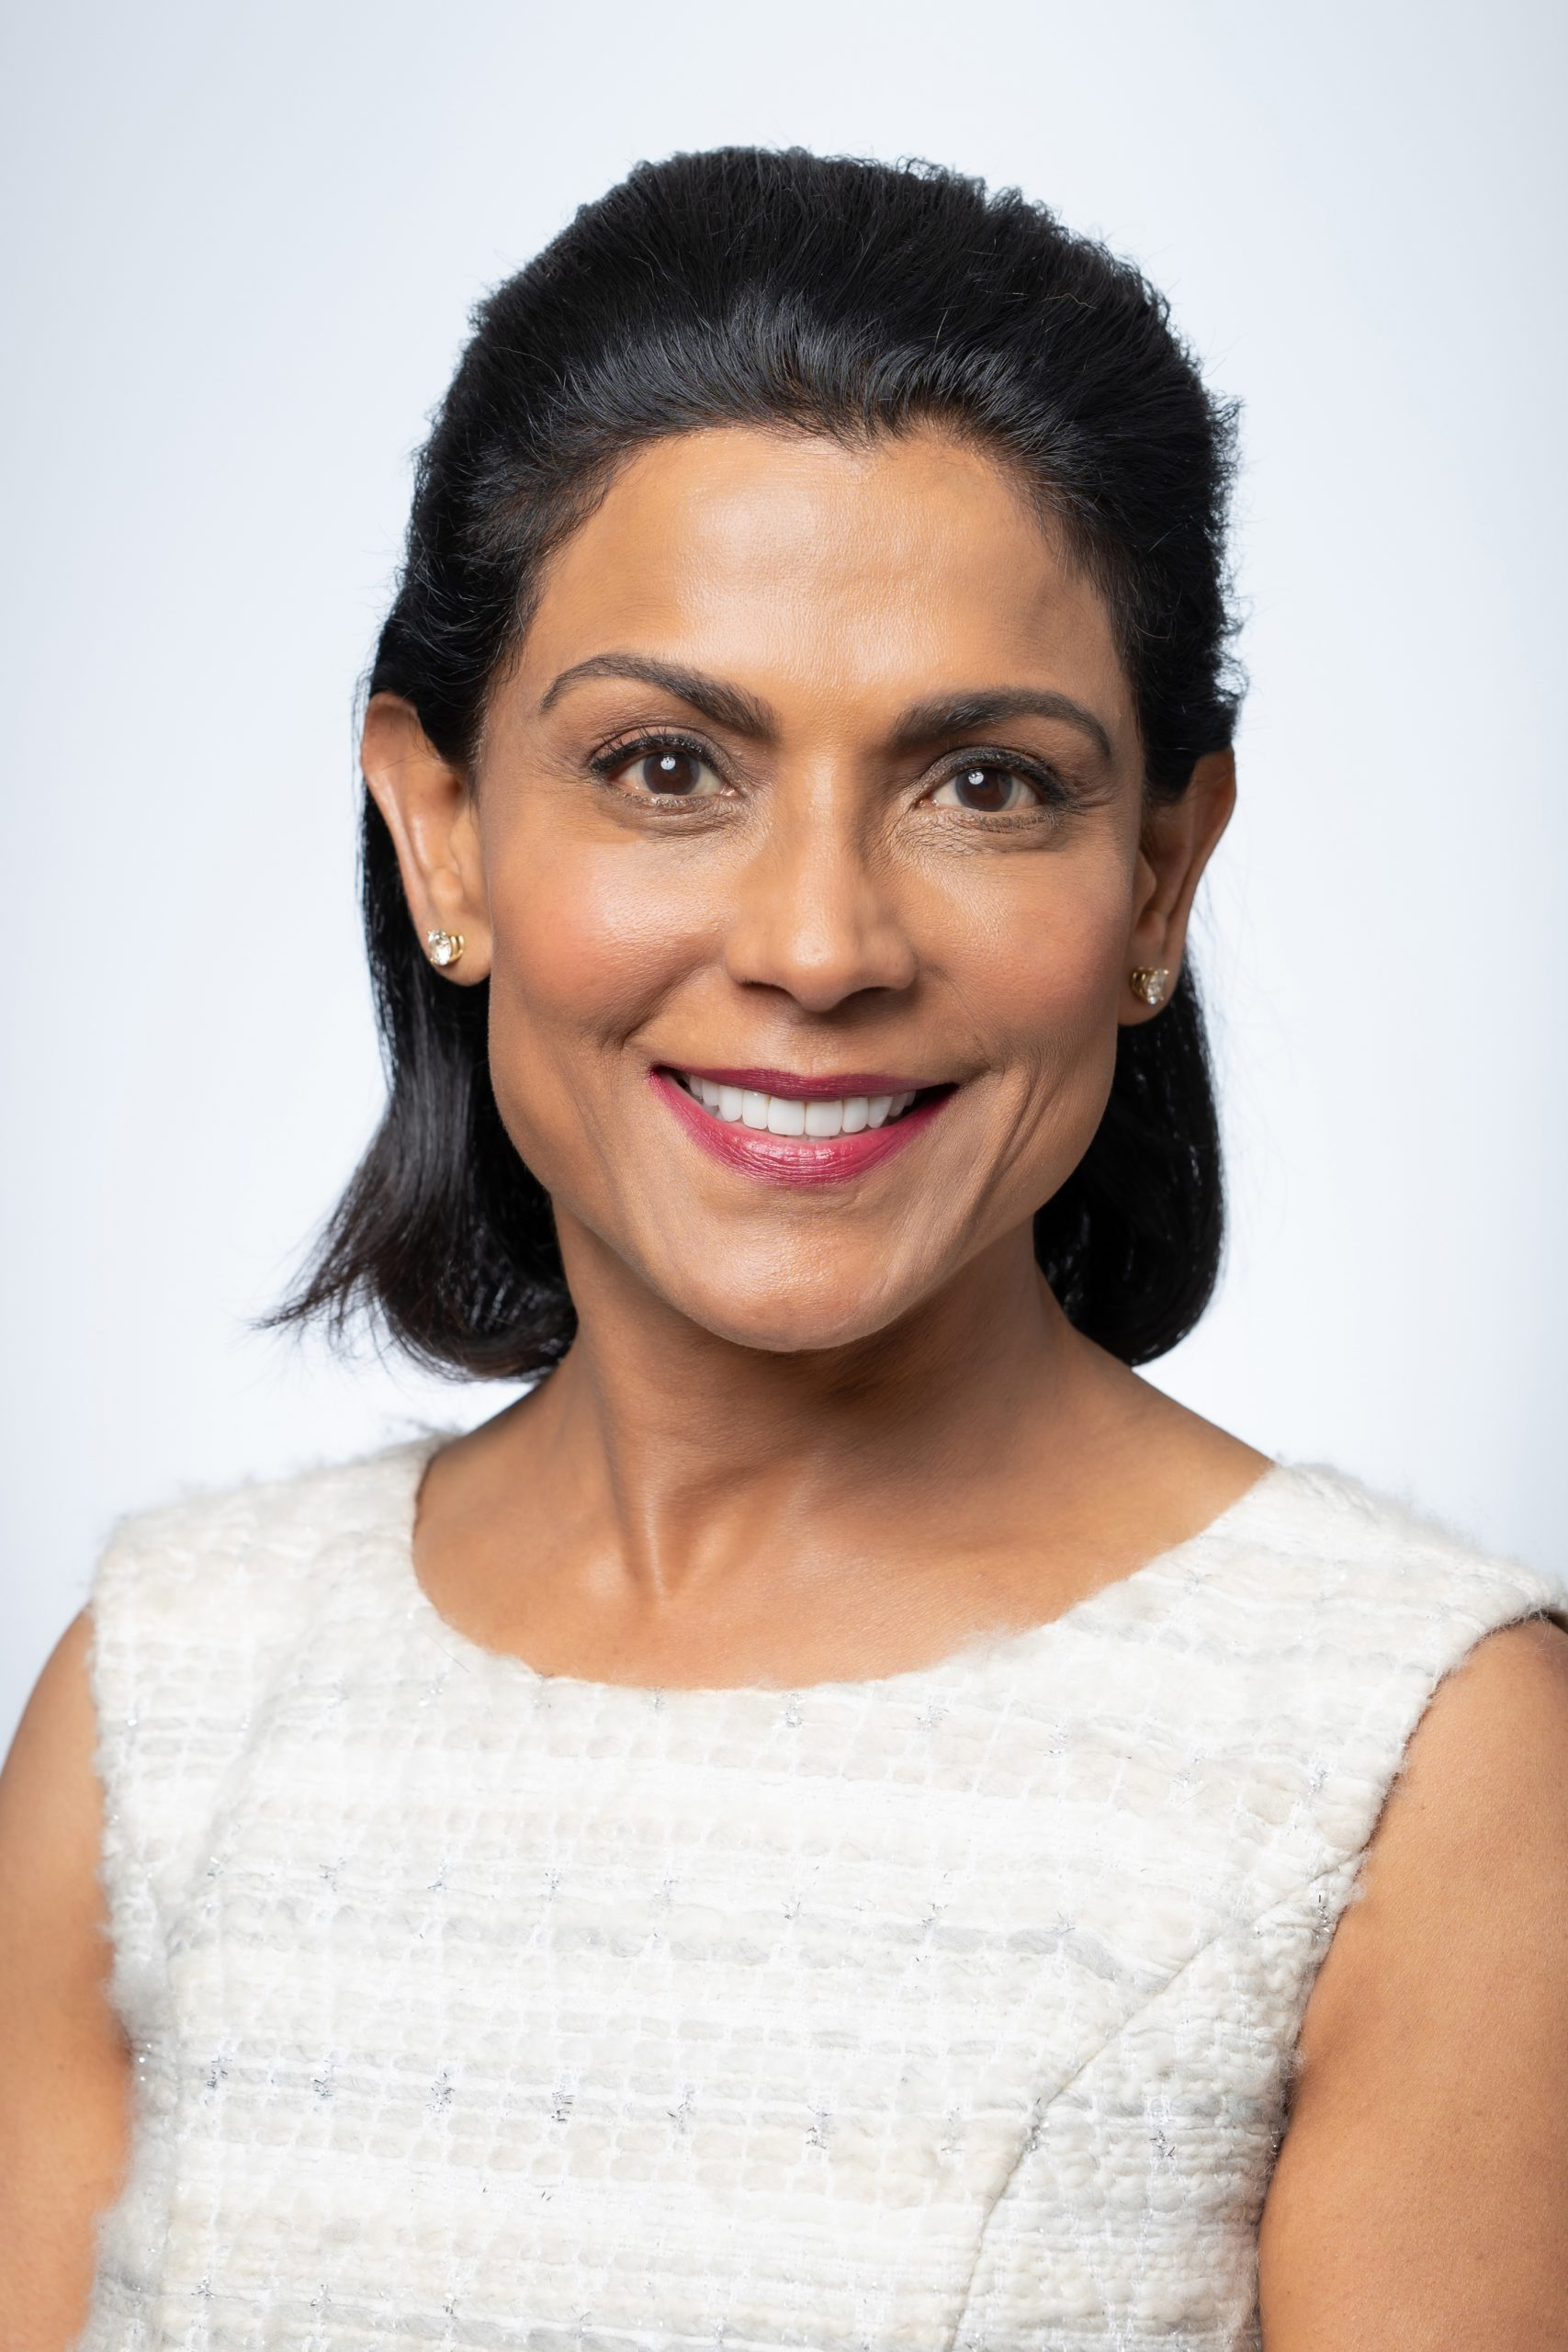 Ranjana Clark has been appointed to Xometry's Board of Directors. Photo via Xometry.